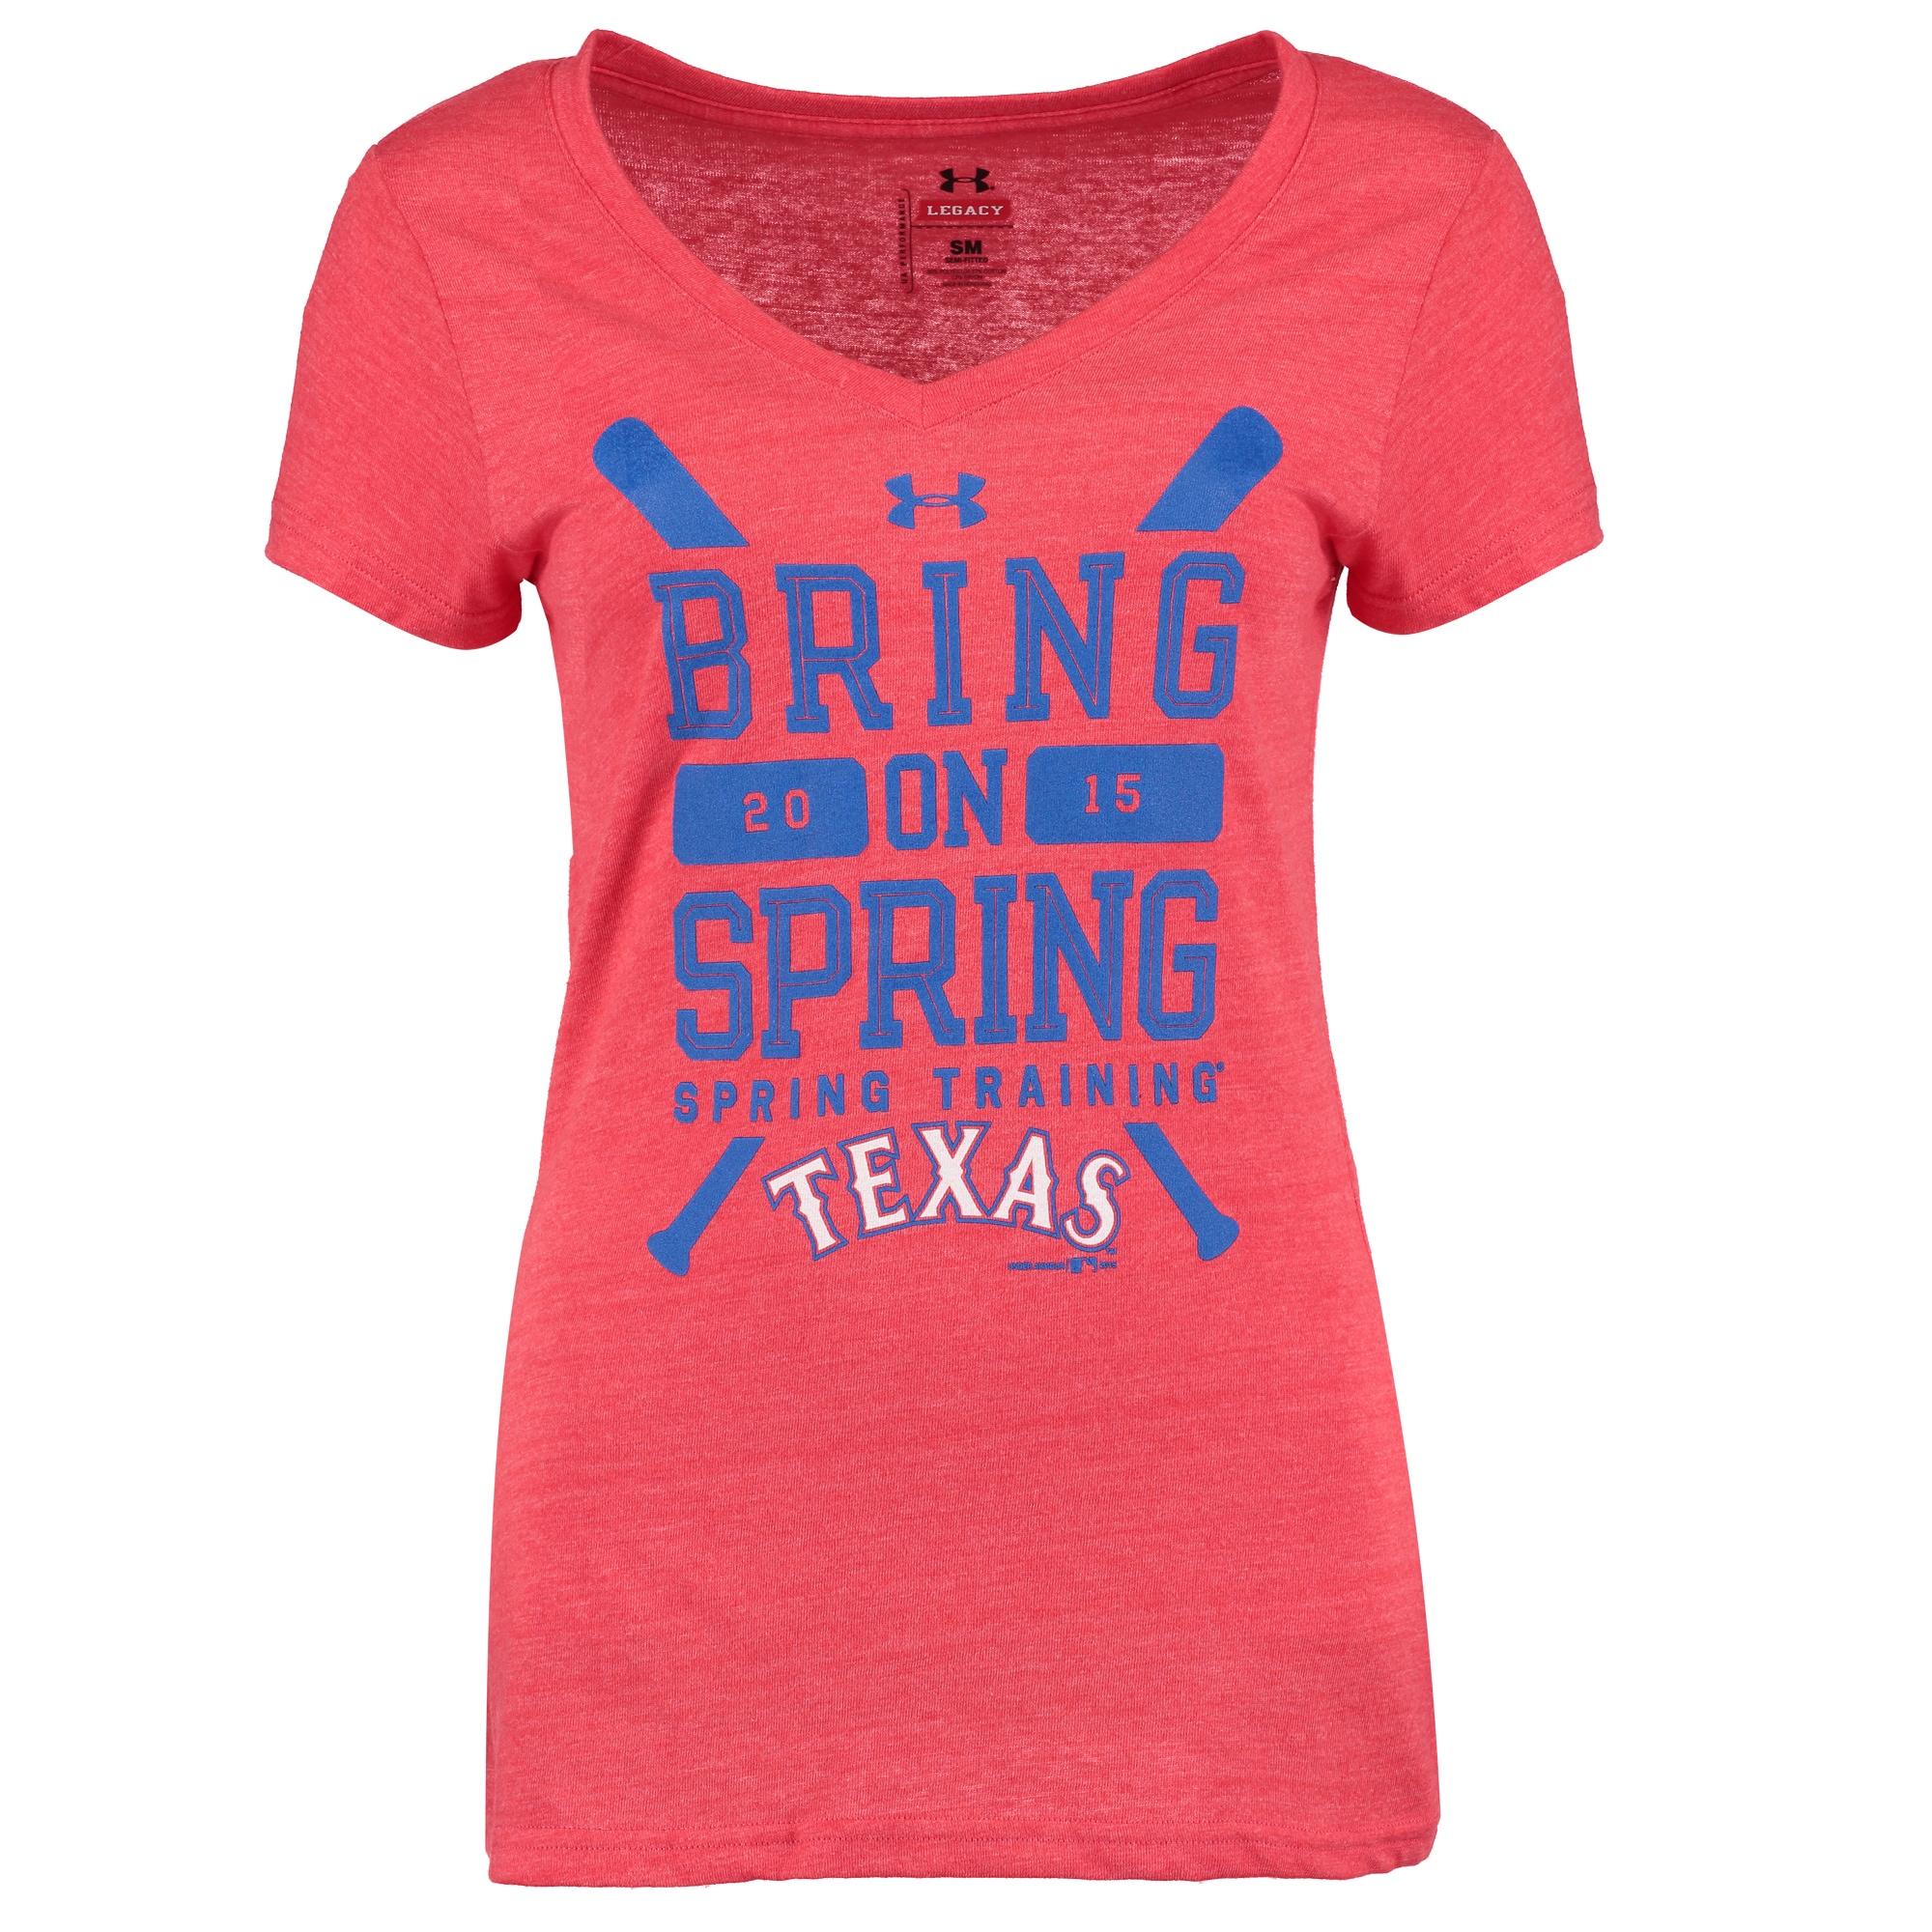 Texas Rangers Under Armour Women's Tri-Blend 2015 Spring Training V-Neck T-Shirt - Red